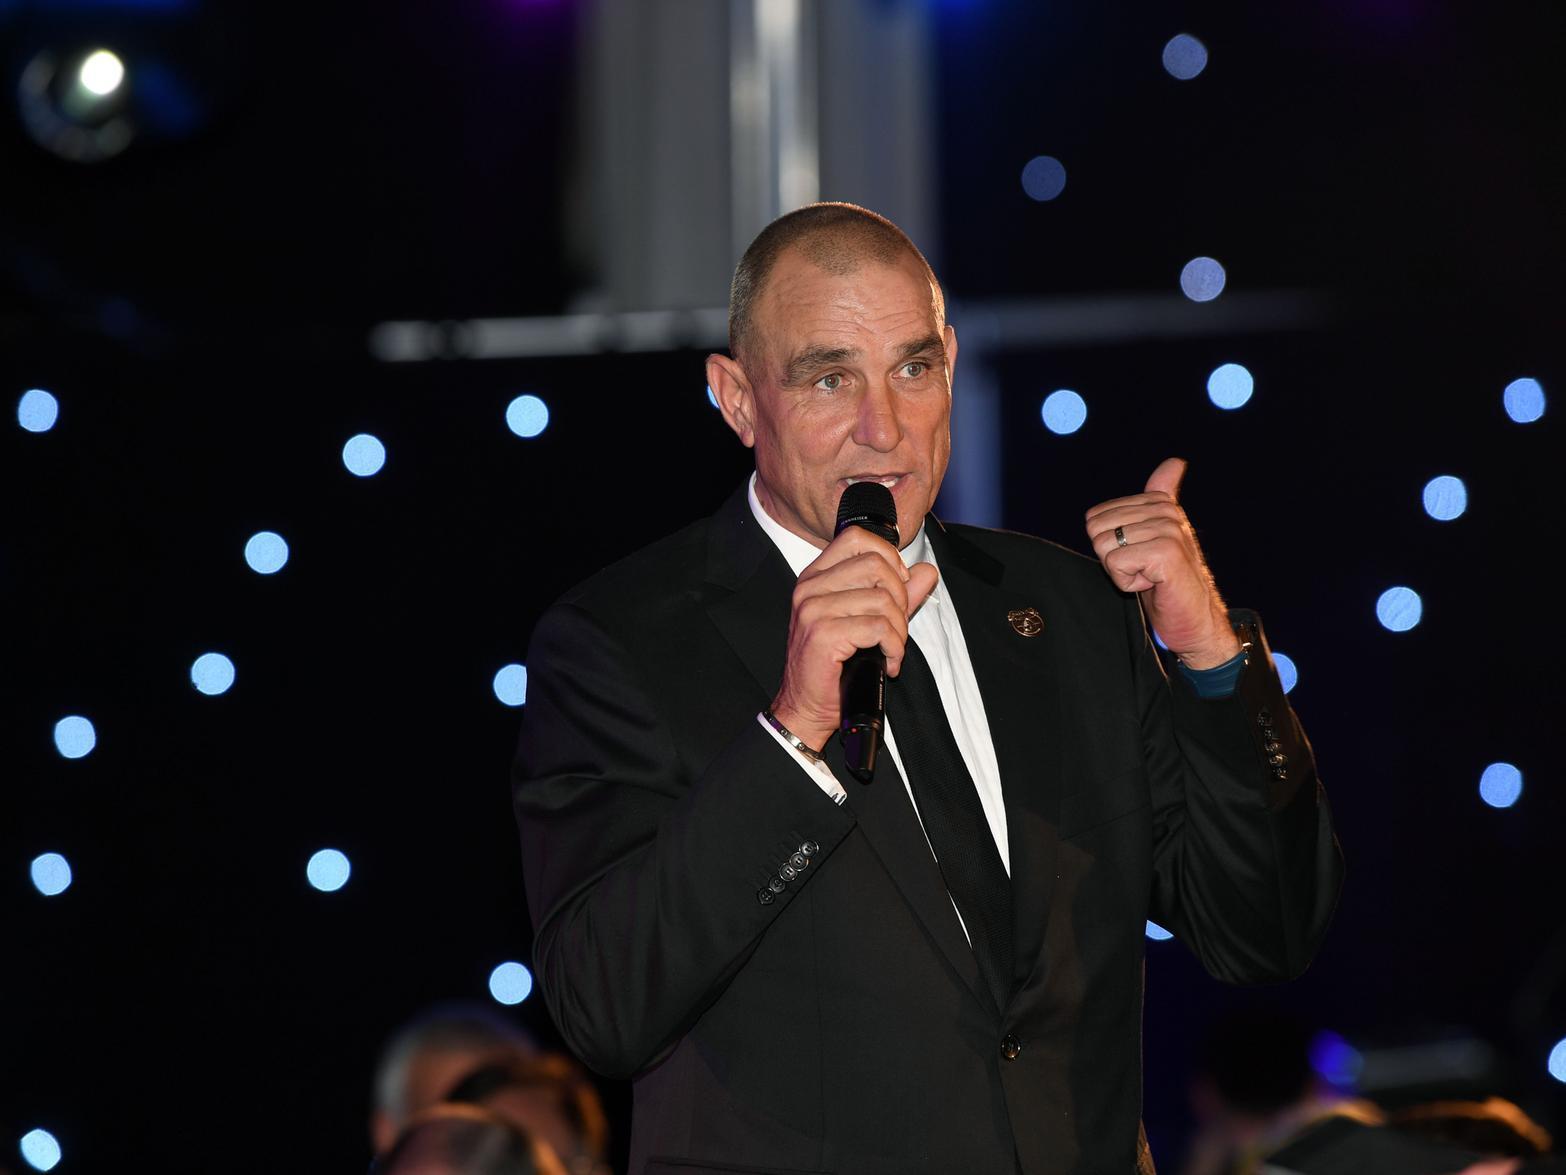 Leeds United legend Vinnie Jones says X Factor is 'what he needed' since wife died